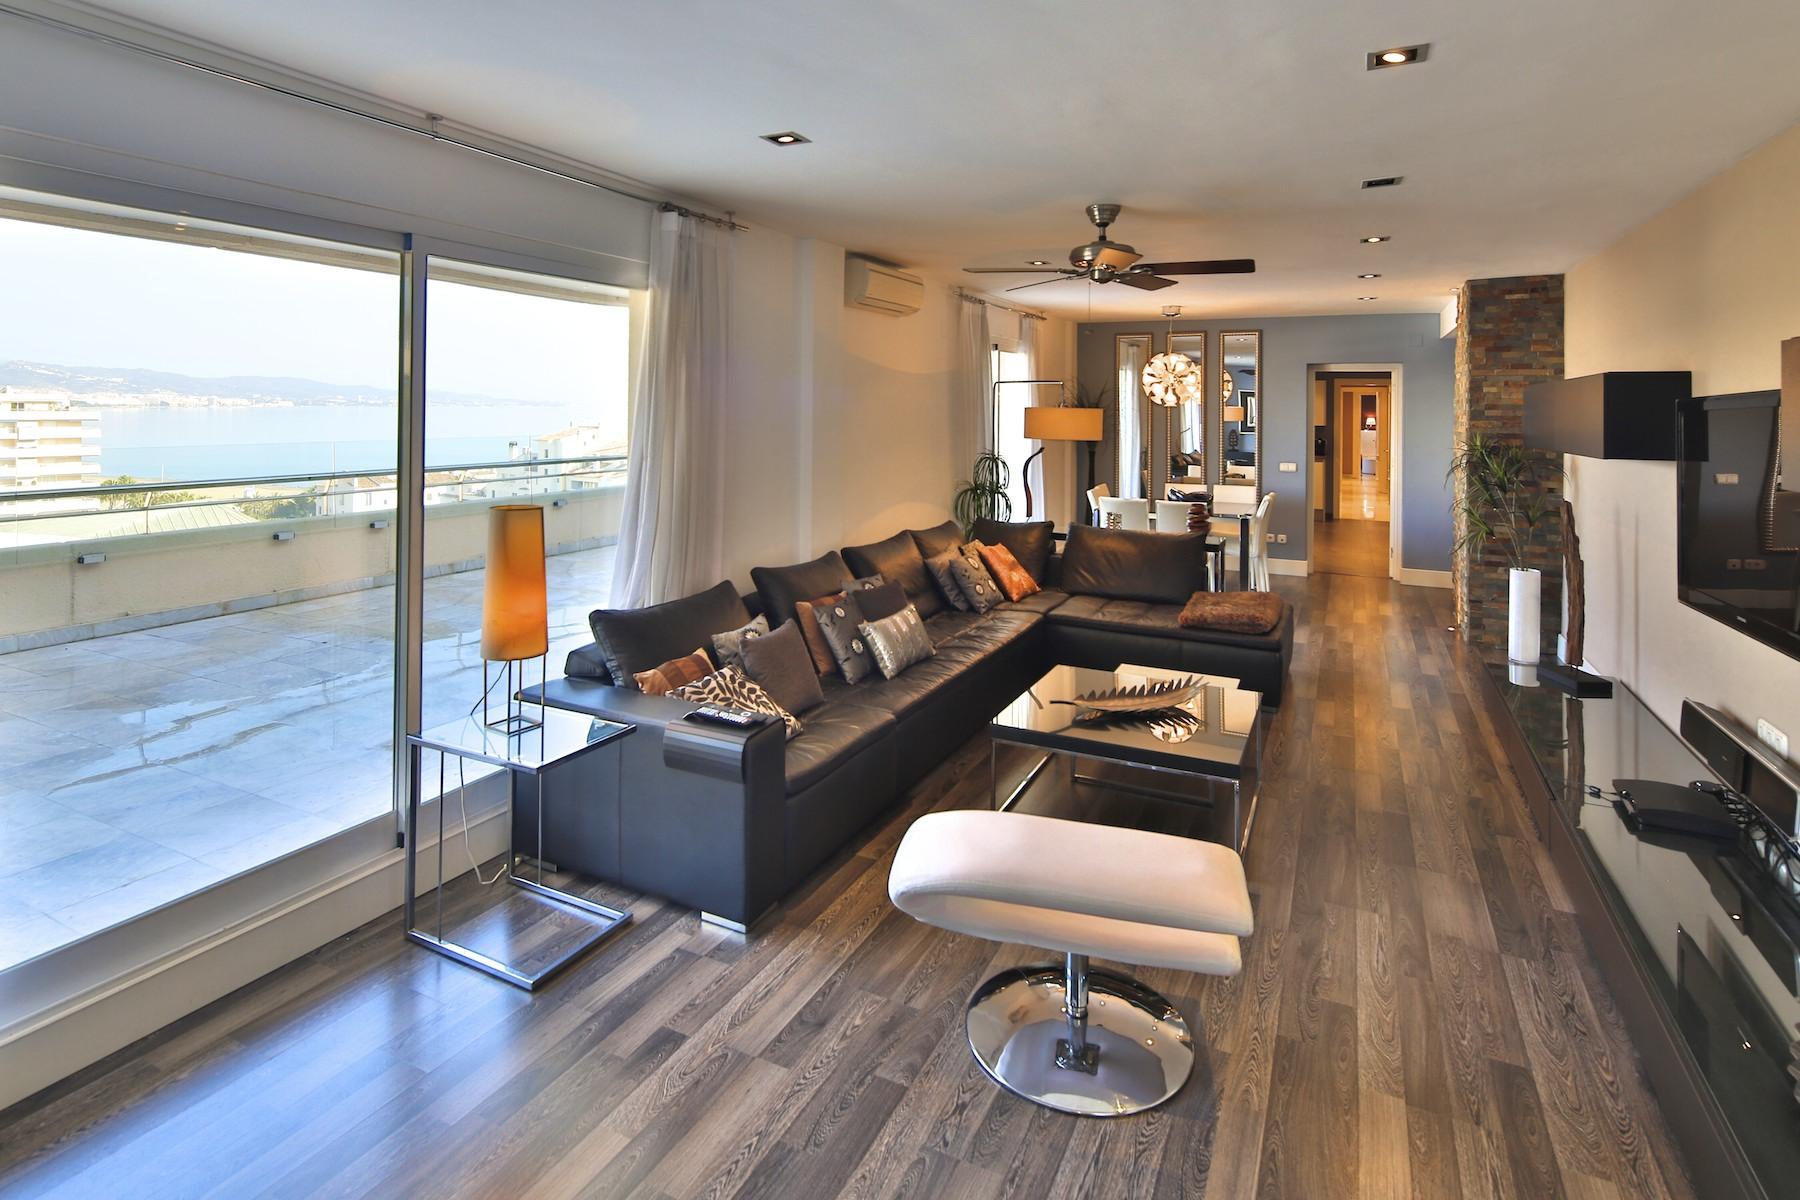 Penthouse for Sale in Marina Banus, Marbella - Puerto Banus